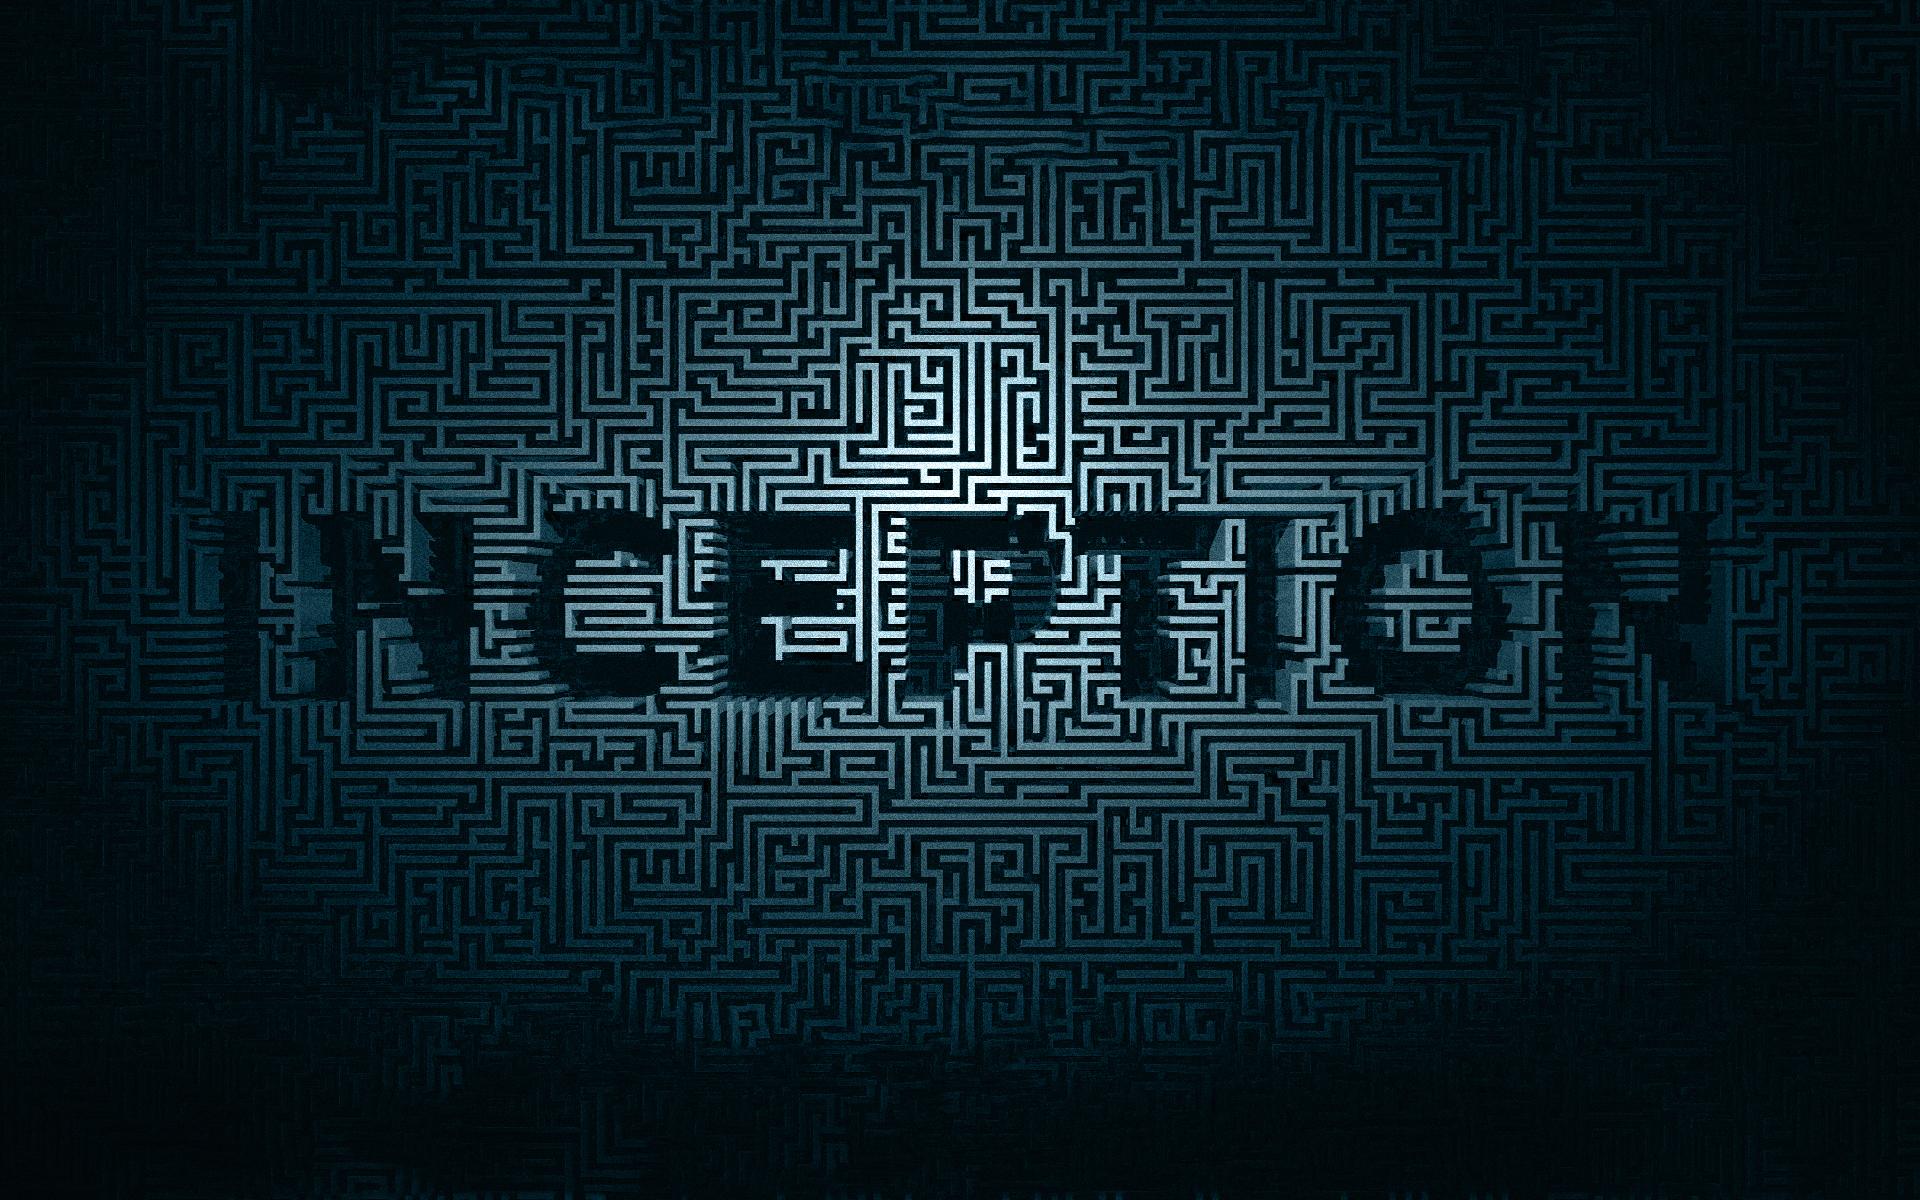 Inception wallpaper 3